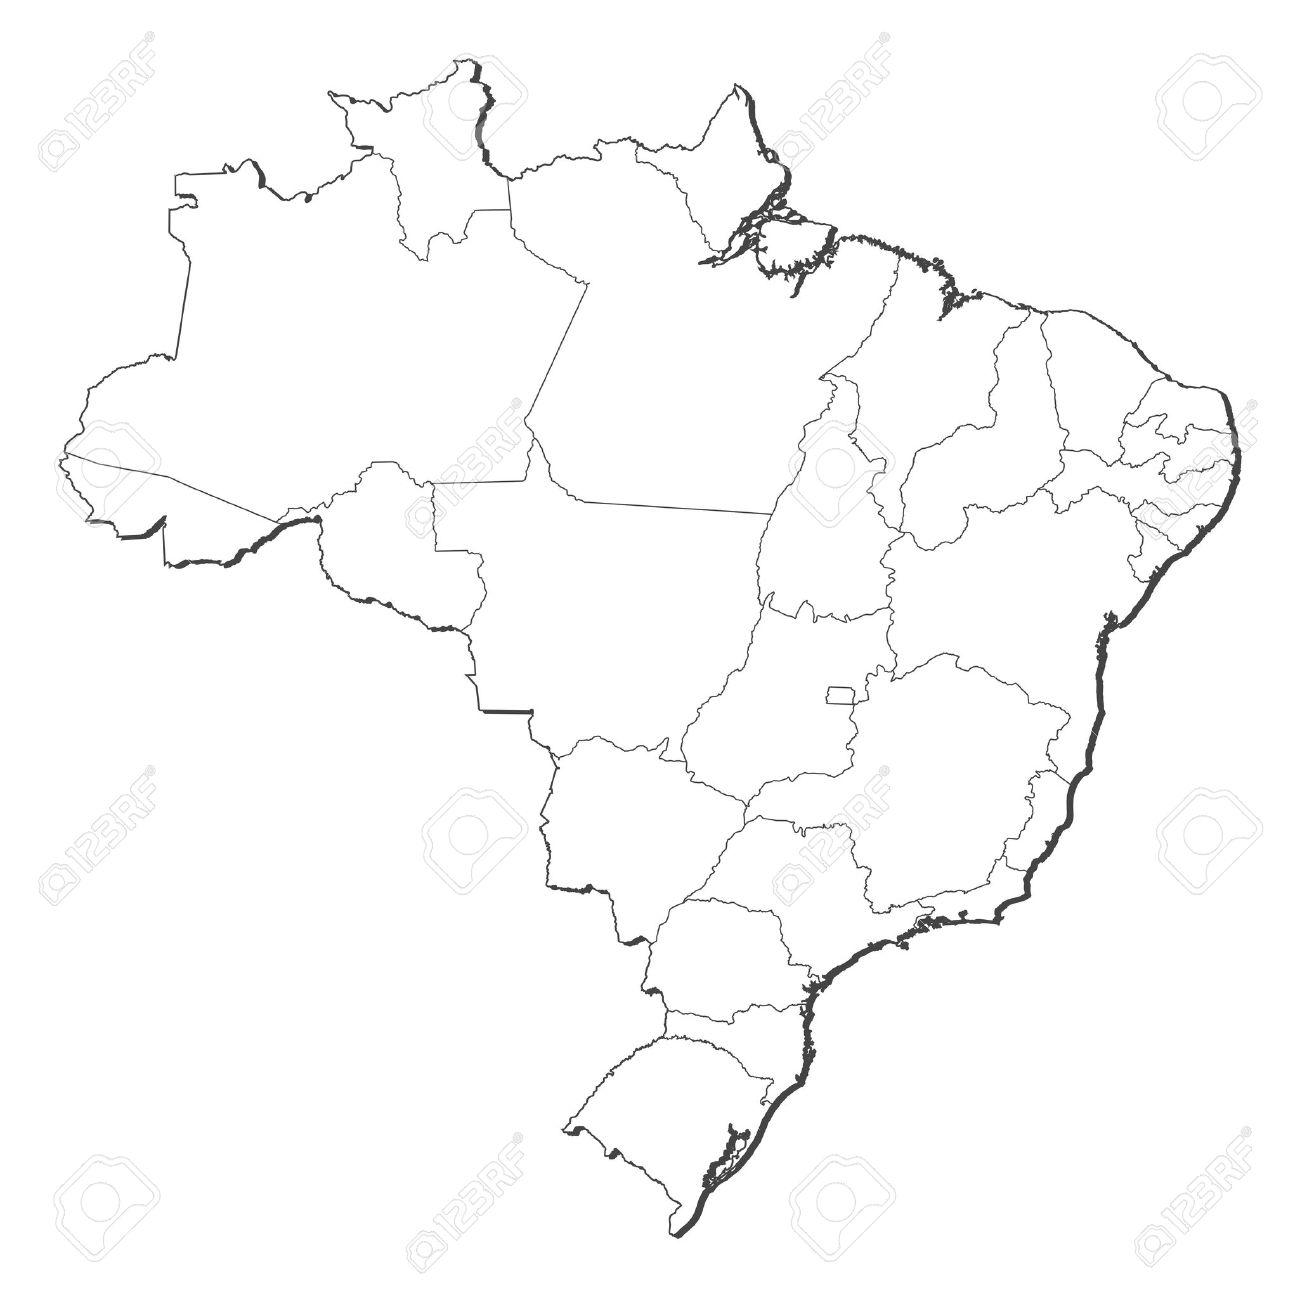 Brazil Map Cliparts Stock Vector And Royalty Free Brazil - Brazil map illustration